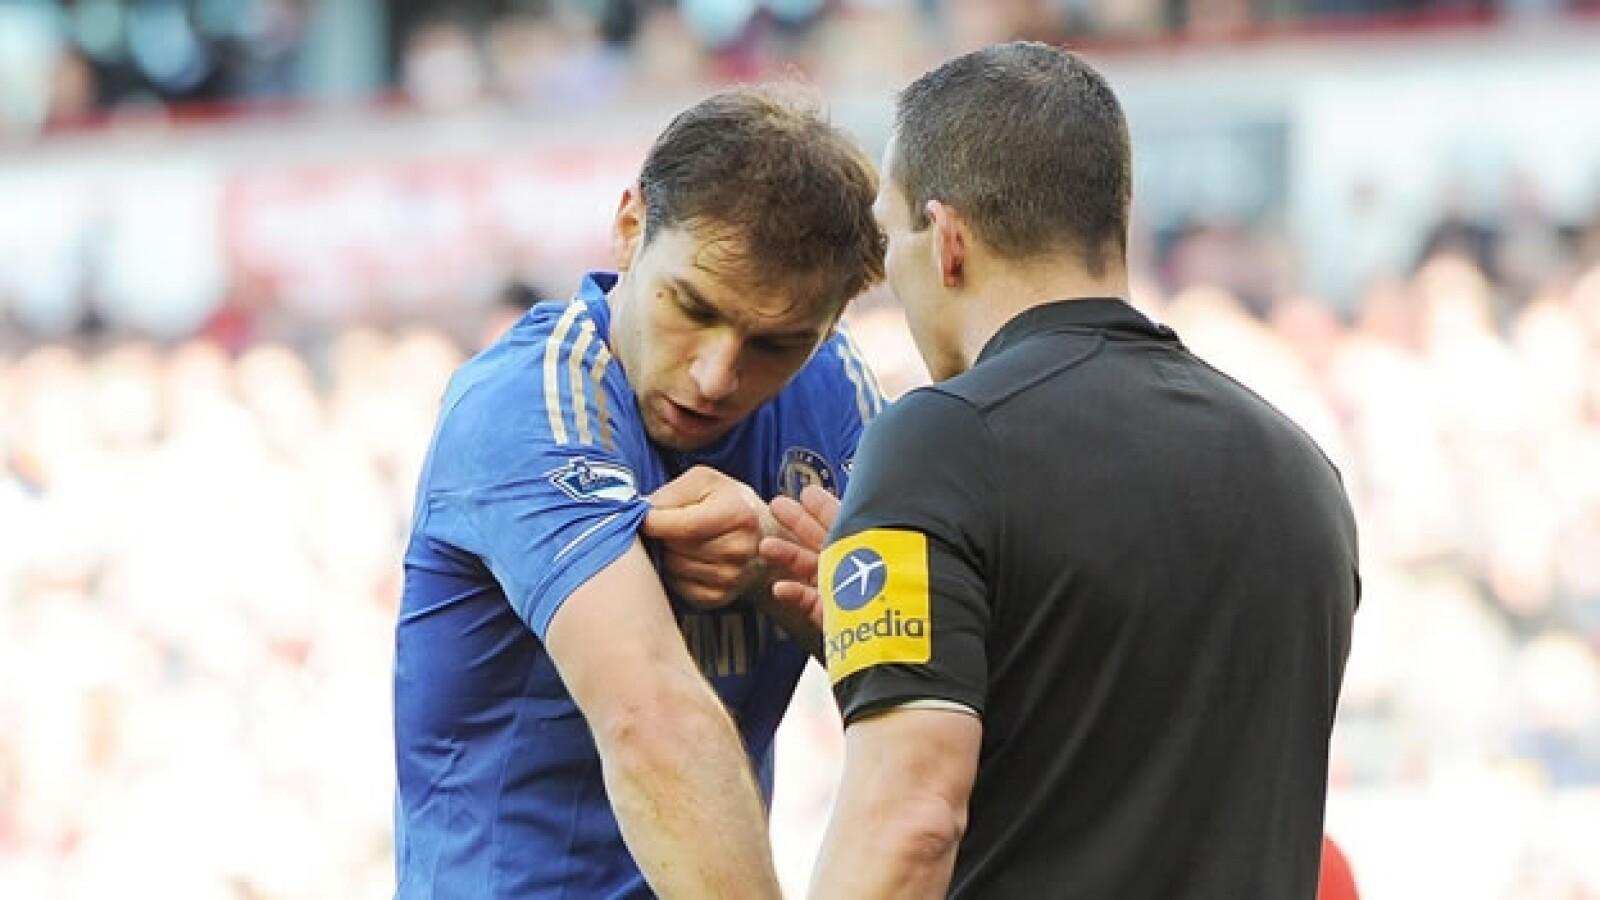 Luis Suarez muerde a Branislav Ivanovic